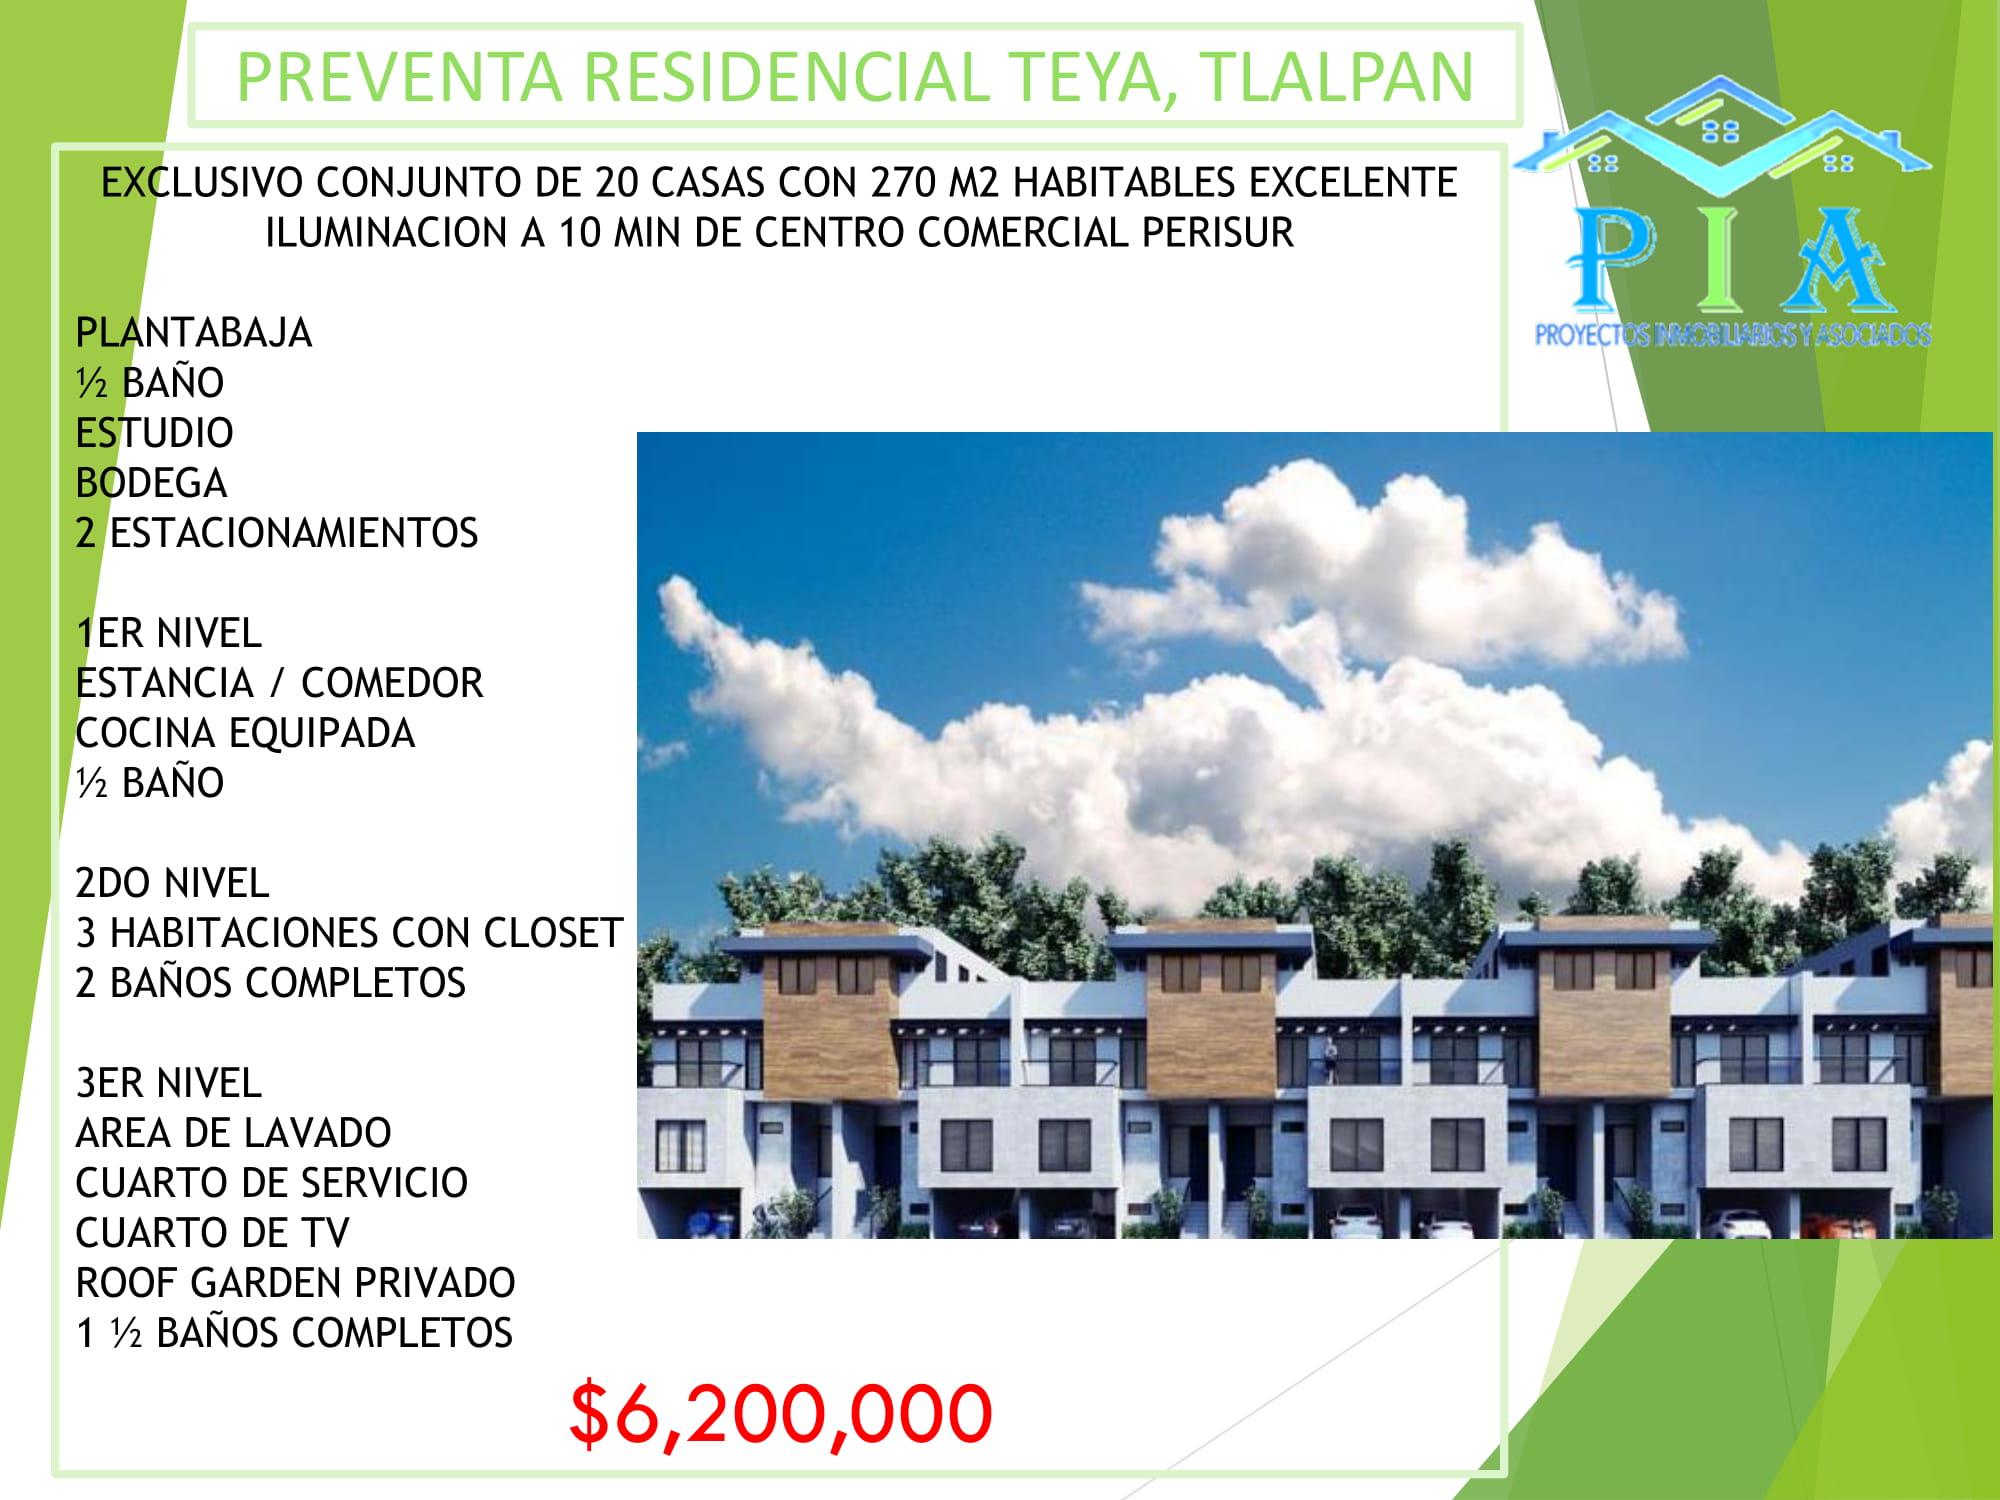 https://0201.nccdn.net/1_2/000/000/14f/3bd/venta-residencial-teya-1.jpg